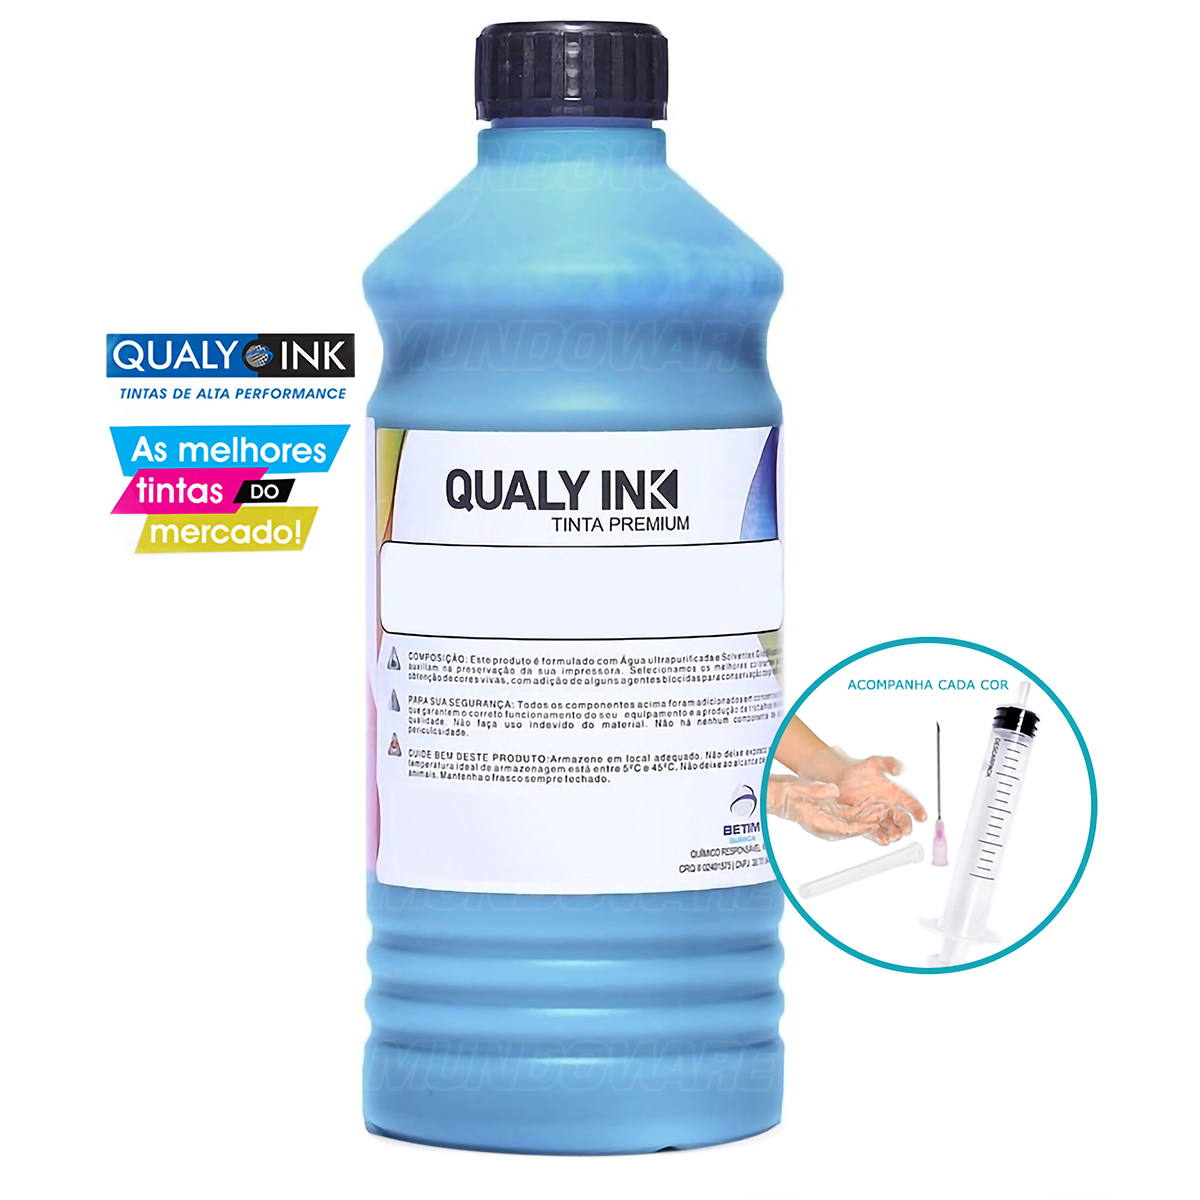 Compatível: Tinta Corante Qualy-Ink CC3H-1182 para HP SmartTank 450 455 GT-5822 5820 InkTank 315 316 Ciano Refil 1L